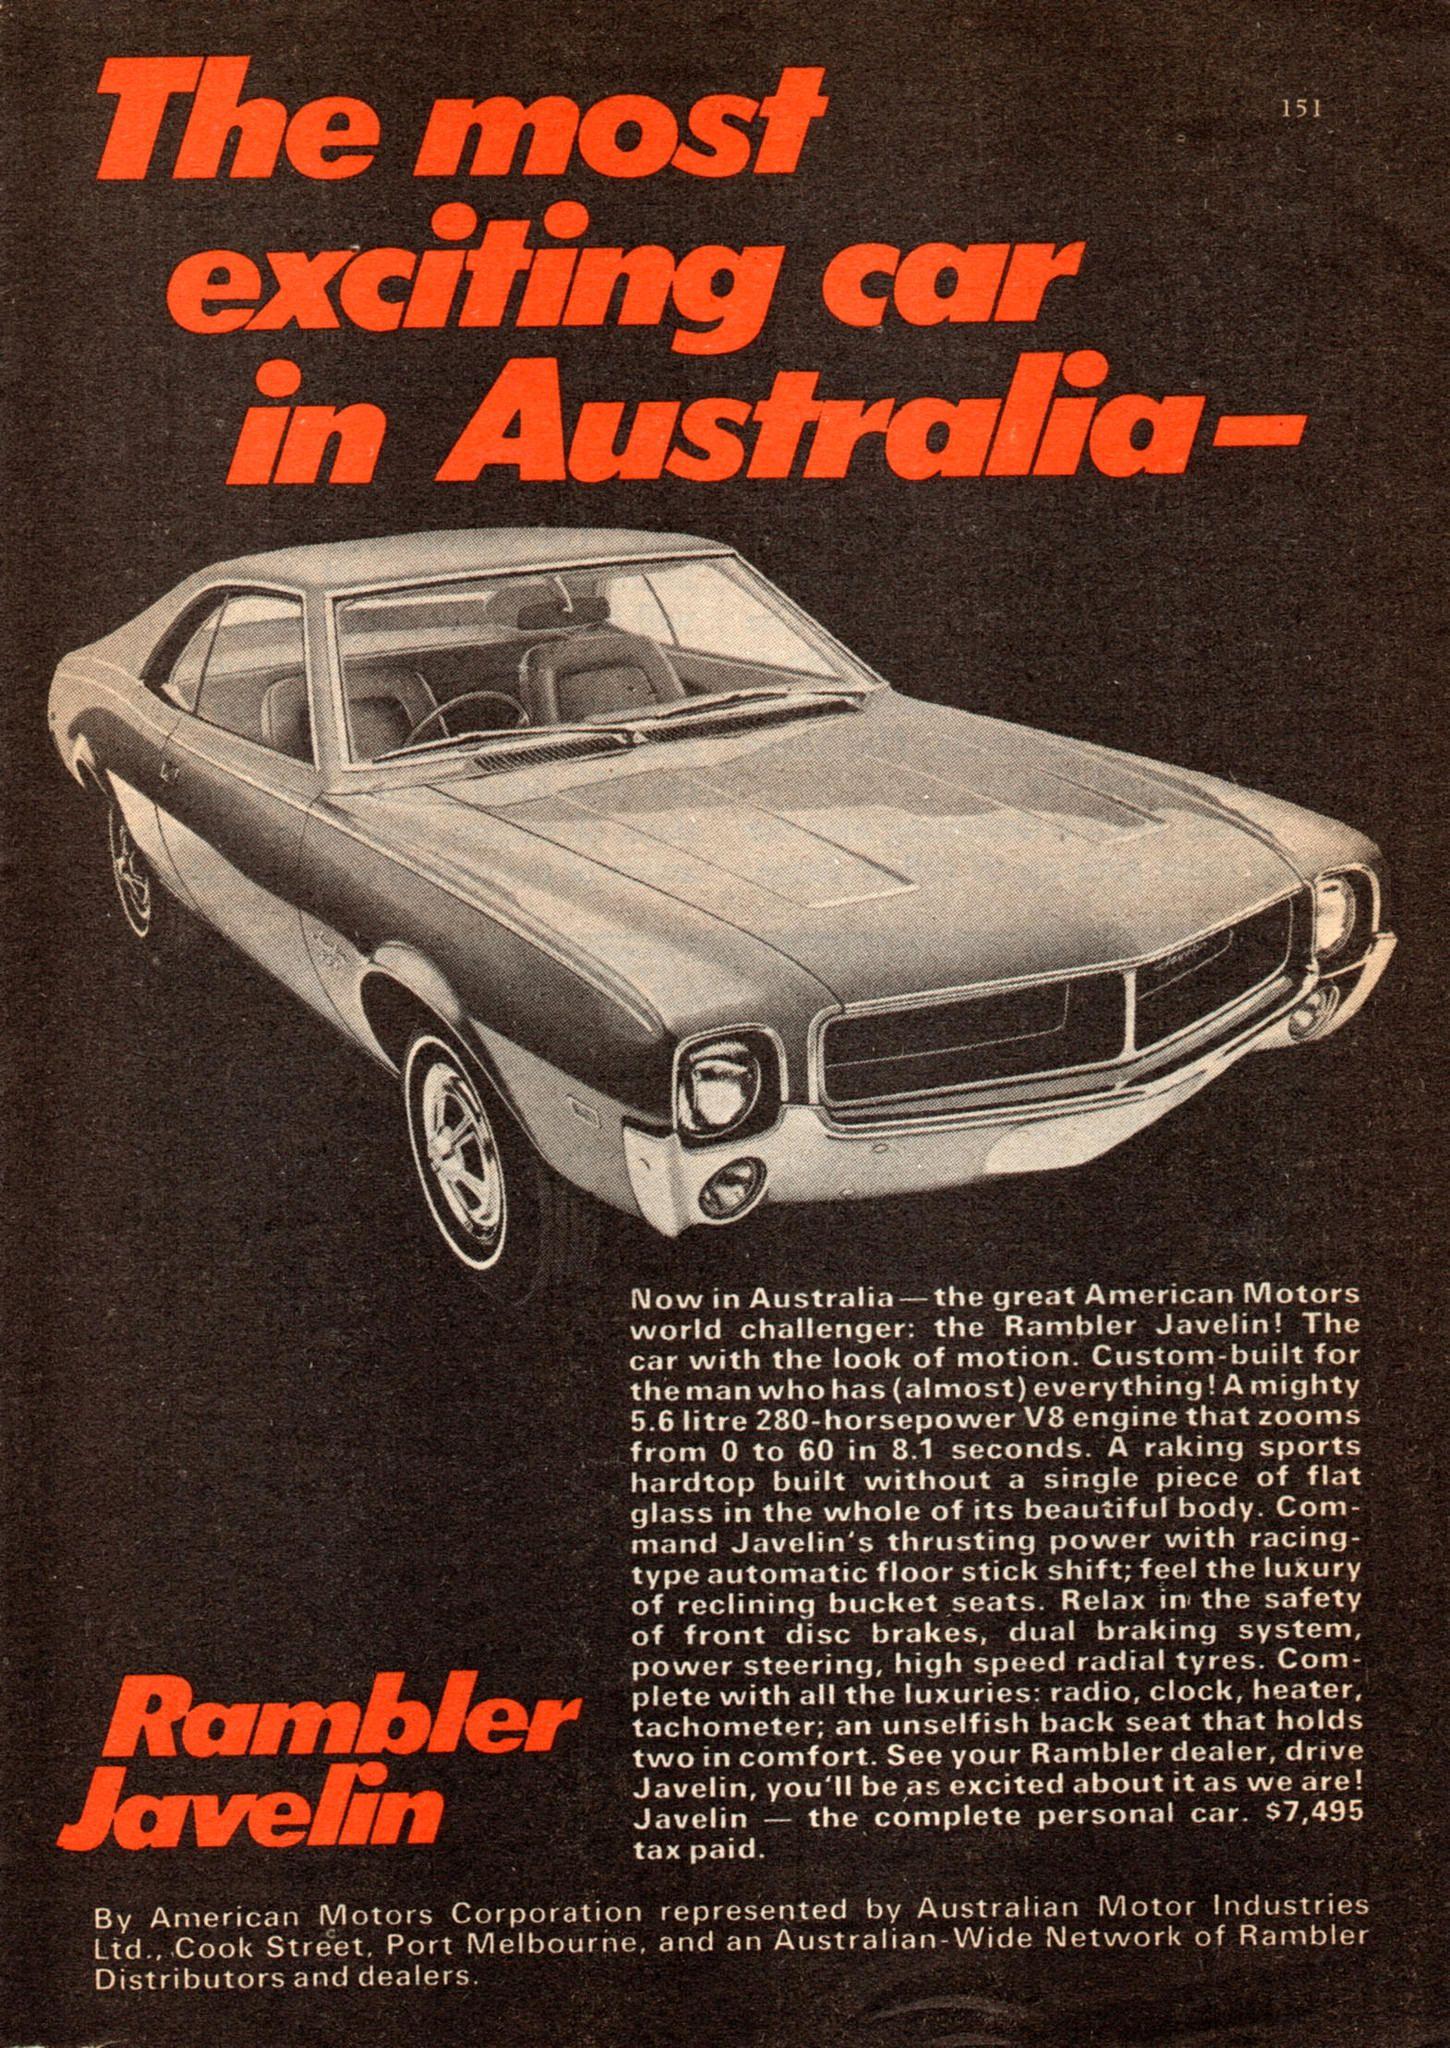 1969 Rambler Javelin Sport Coupe Amc Ami Aussie Original Magazine